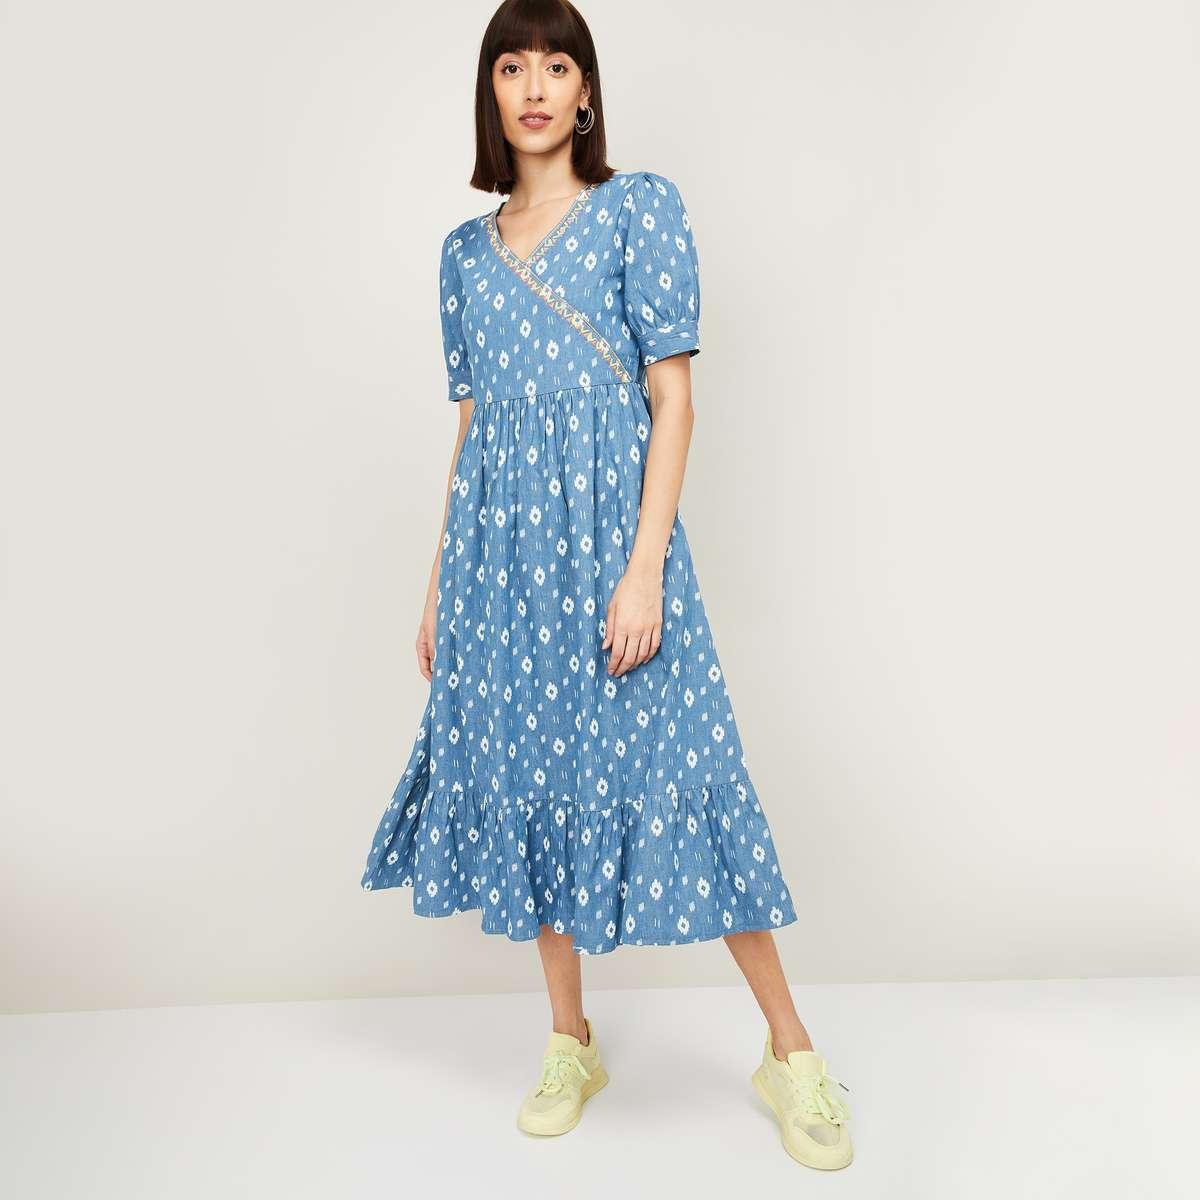 3.COLOUR ME Raga Women Printed Short Sleeves A-line Midi Dress